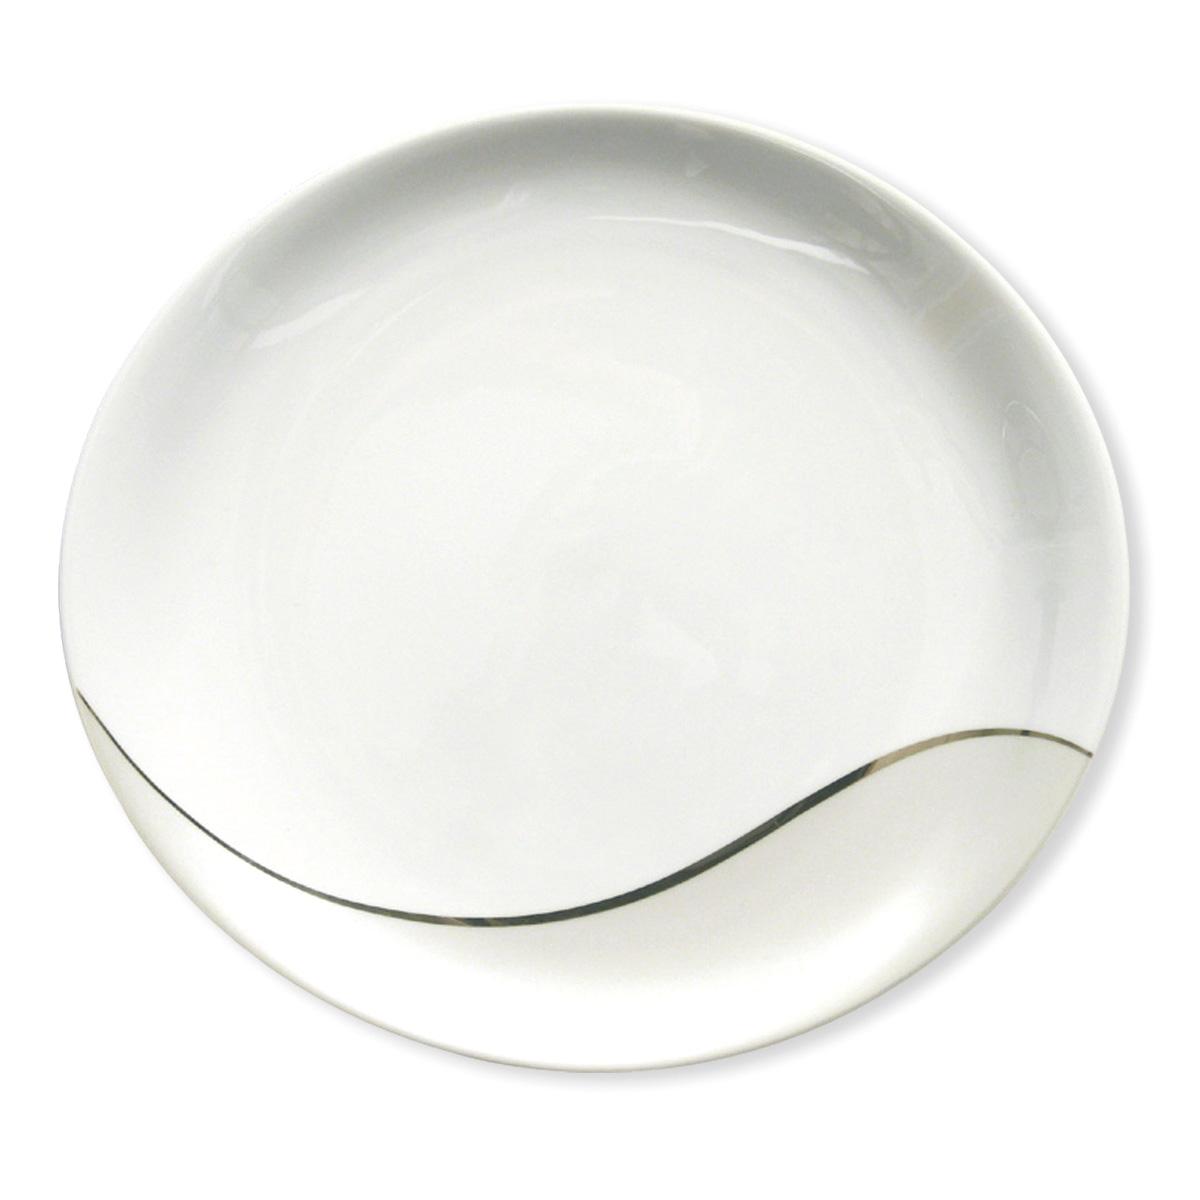 assiette contemporaine en porcelaine vaisselle design bruno evrard. Black Bedroom Furniture Sets. Home Design Ideas